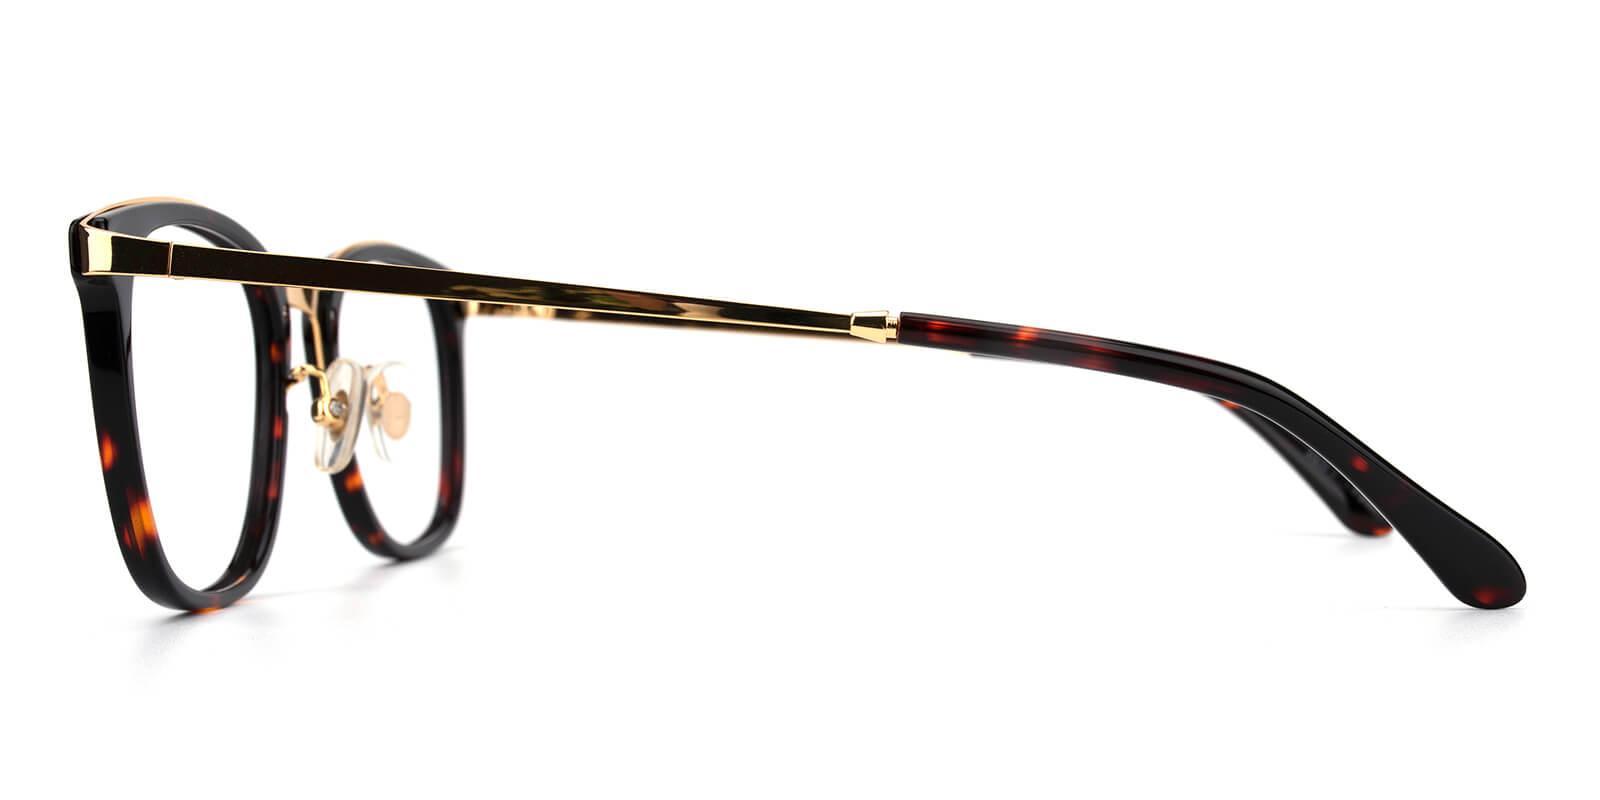 Keronito-Tortoise-Square-Metal-Eyeglasses-detail